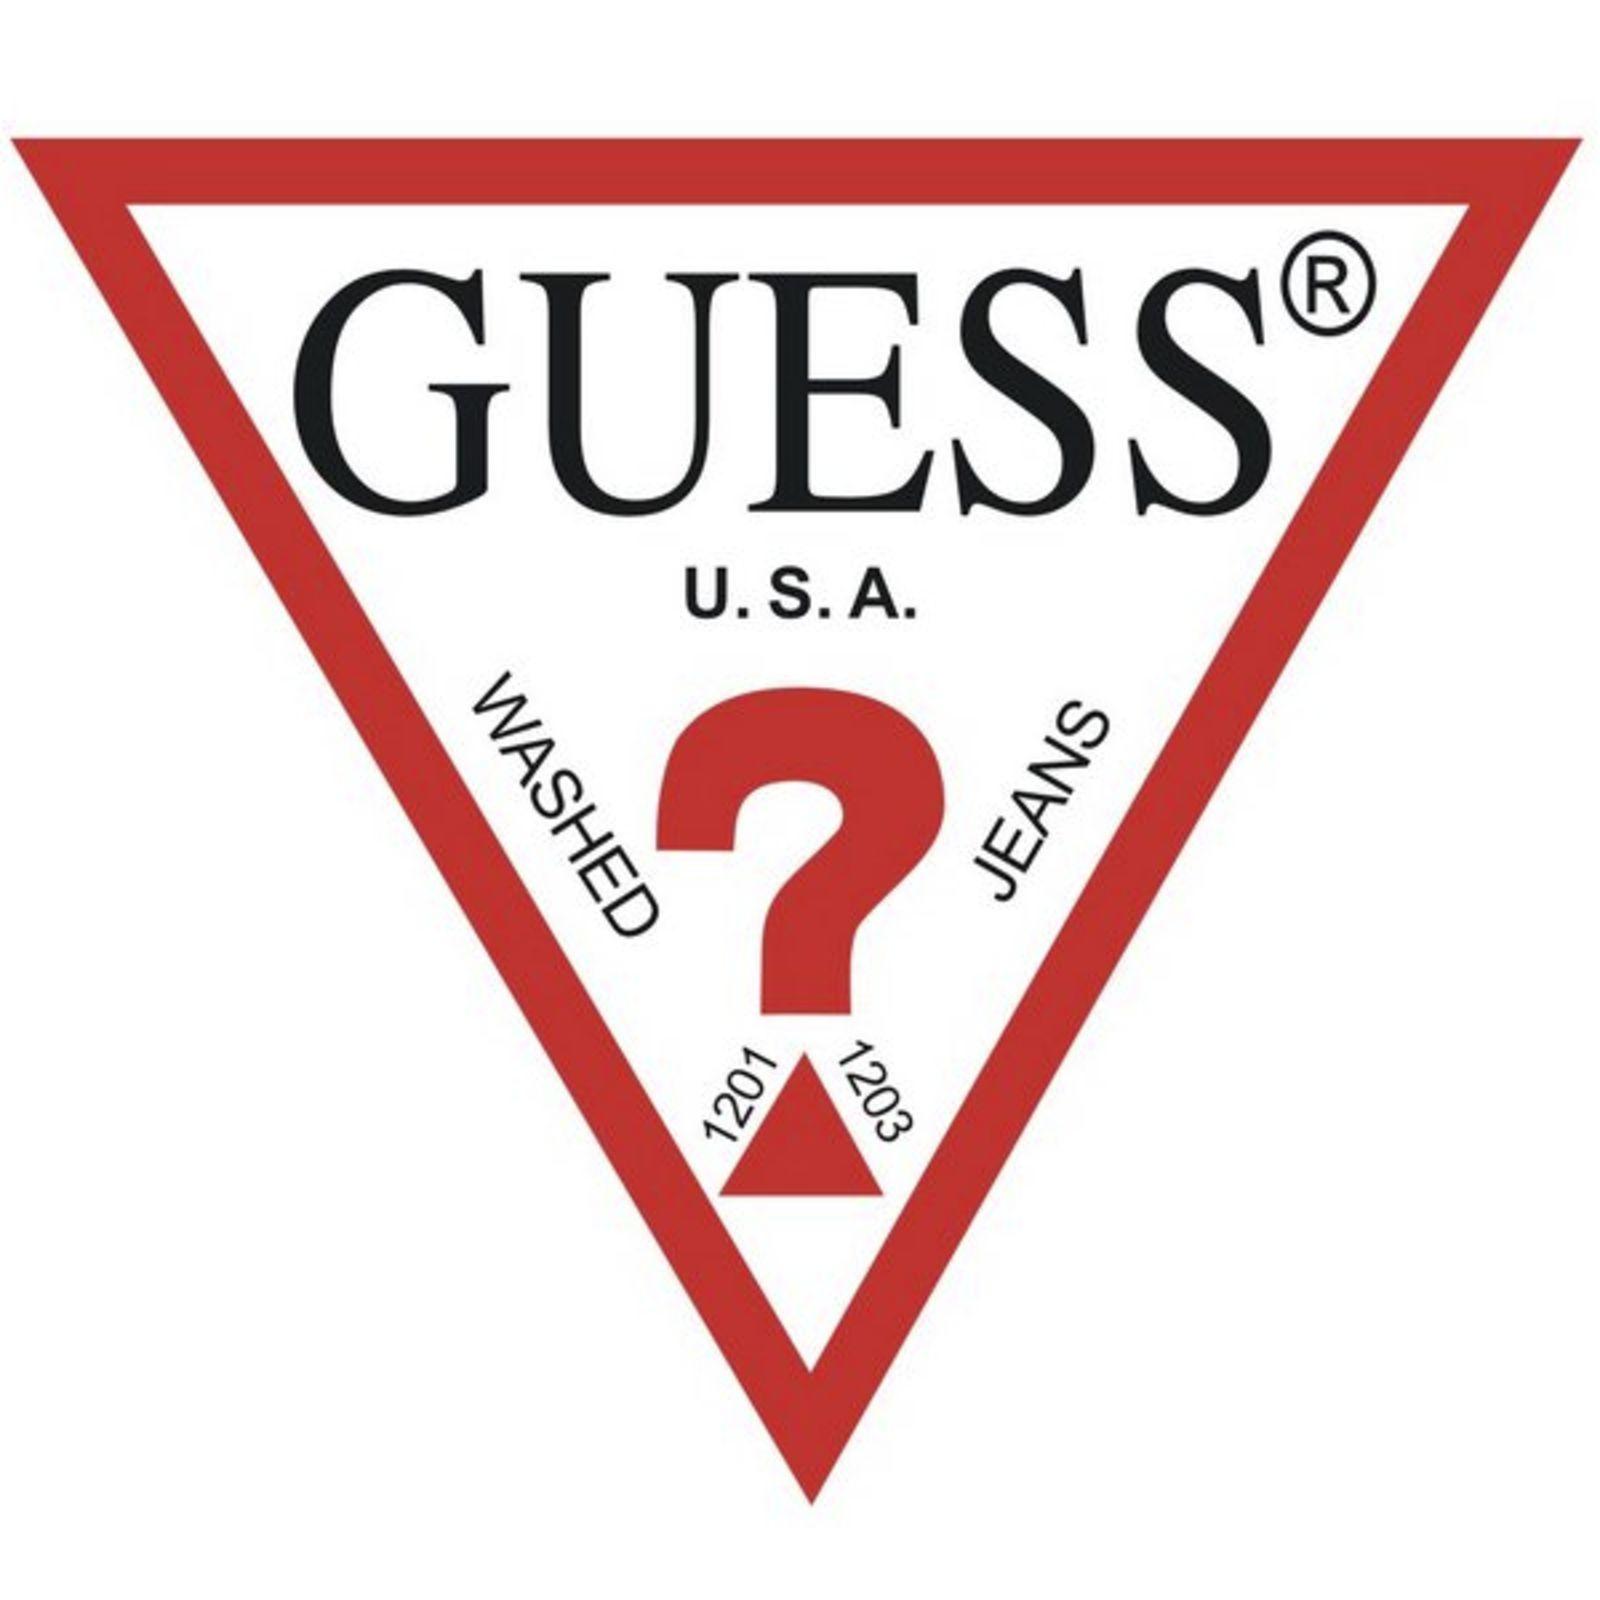 GUESS Kids (Image 1)